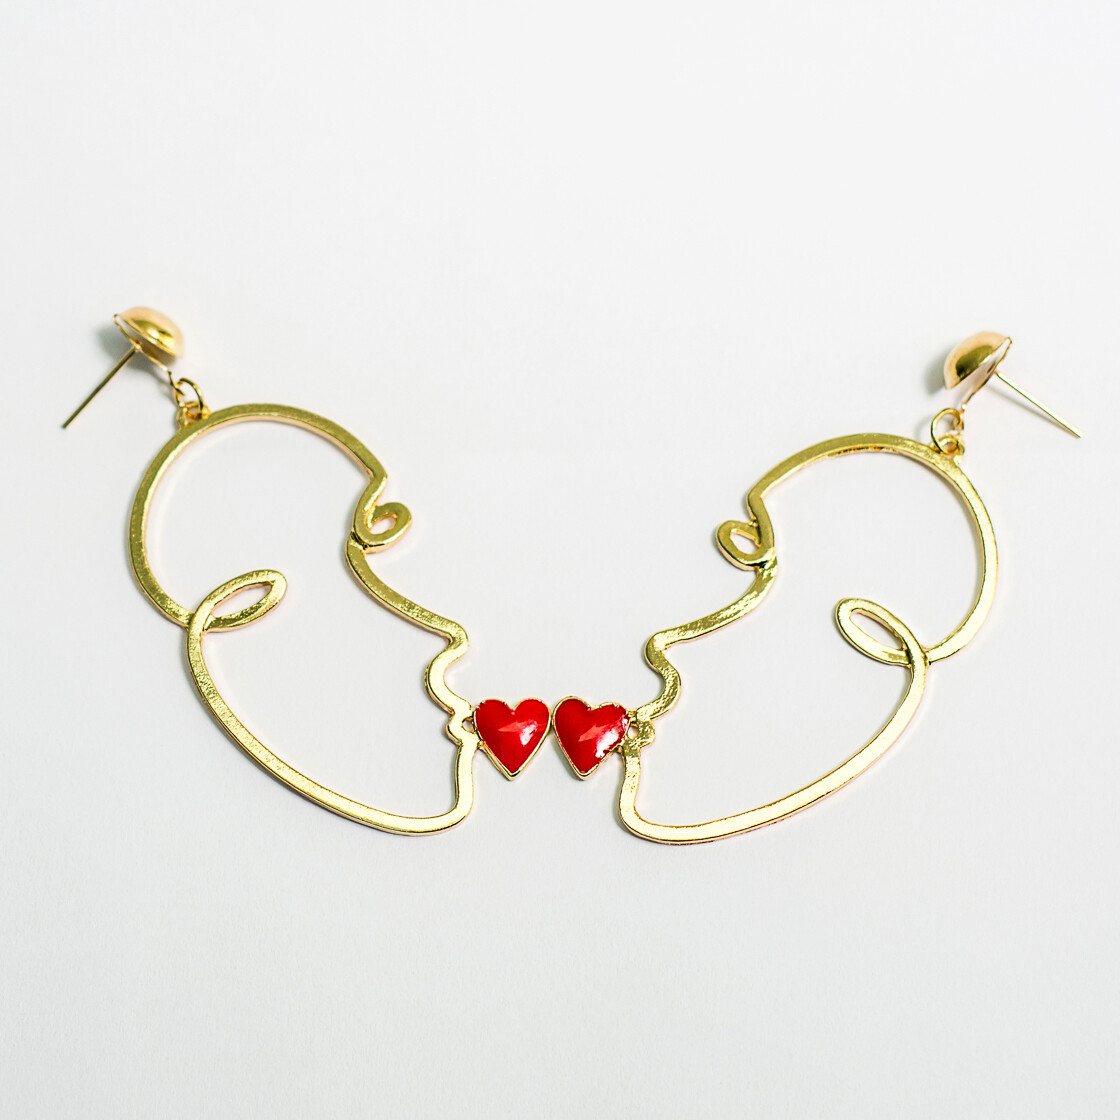 Kiss Face Earrings - BLACKDOLL ACCESSORIES